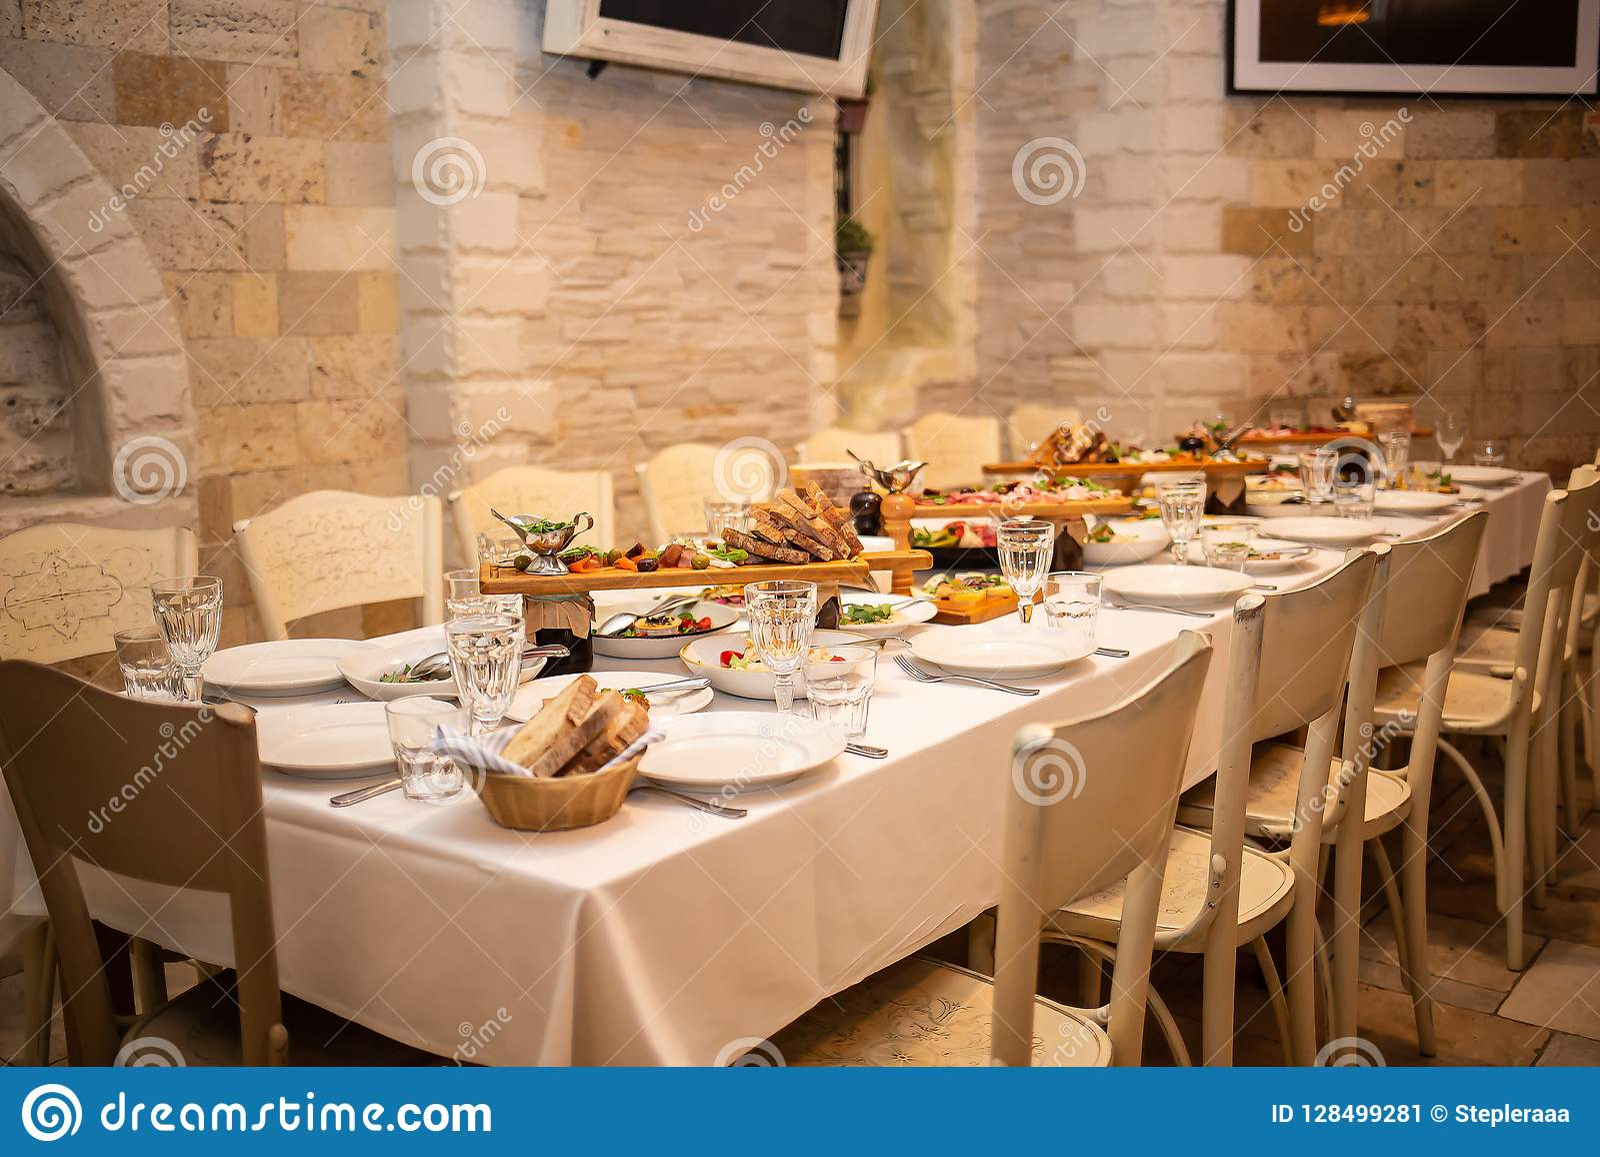 Arrangement de Tableau dans un restaurant italien